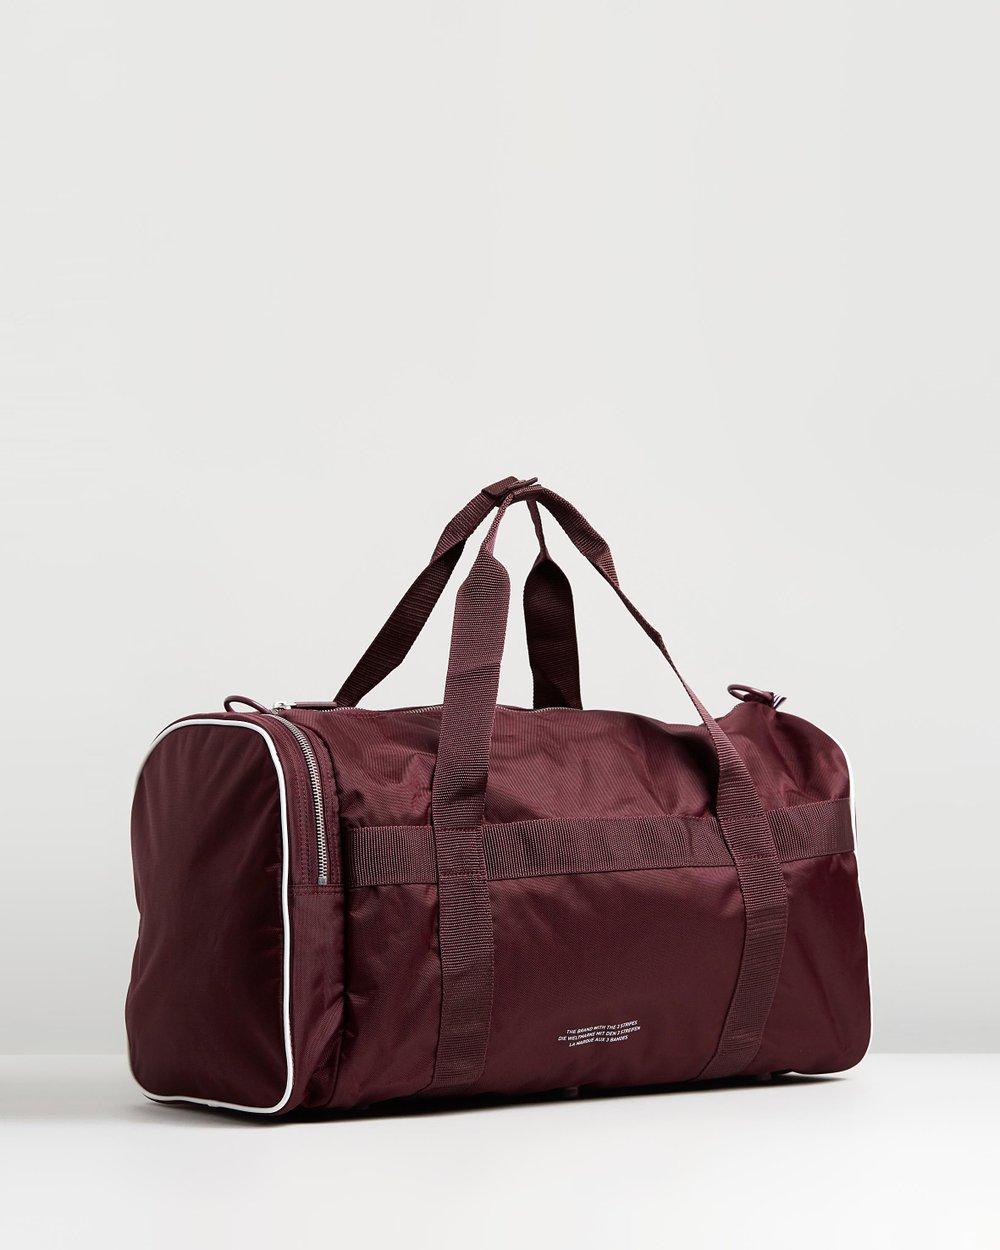 f539c31038 Adicolor Duffle Bag by adidas Originals Online